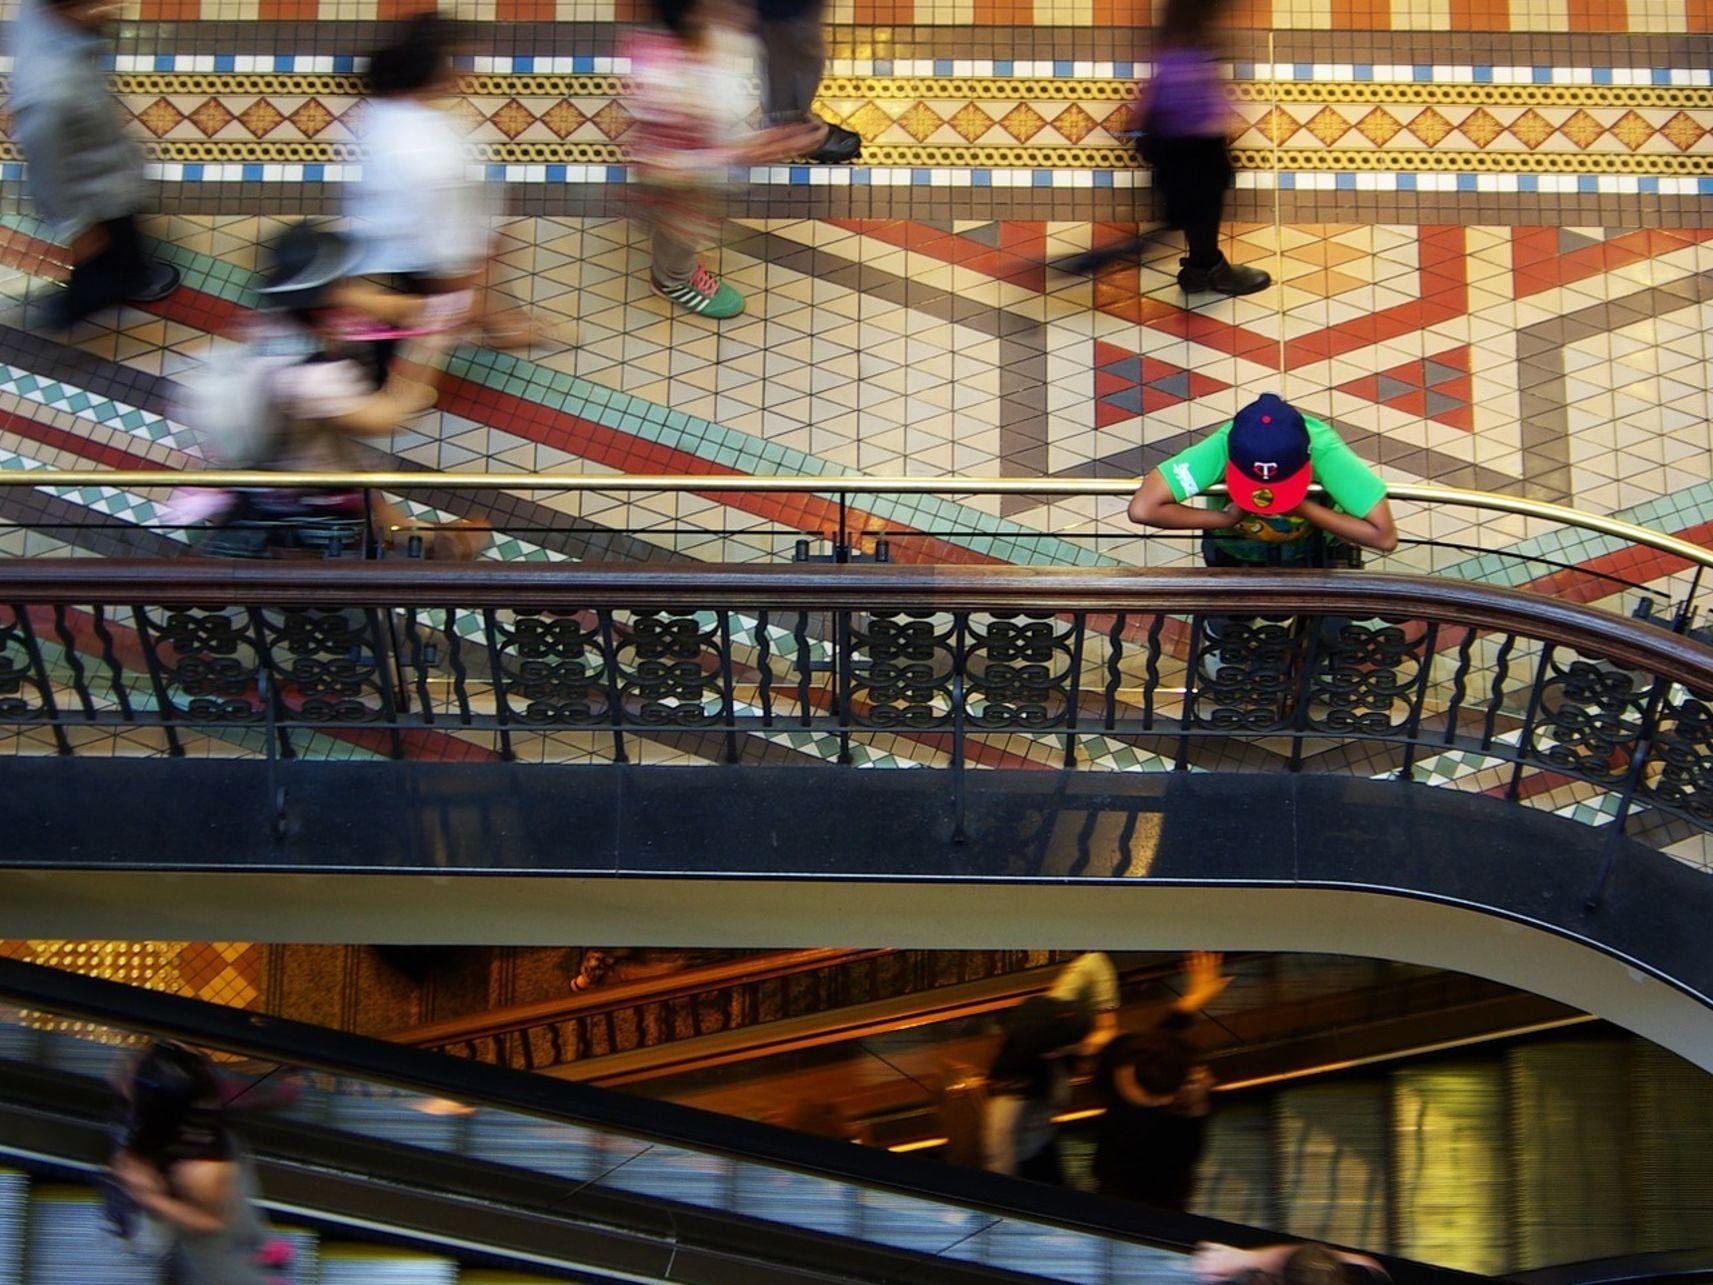 Mall pr66rz